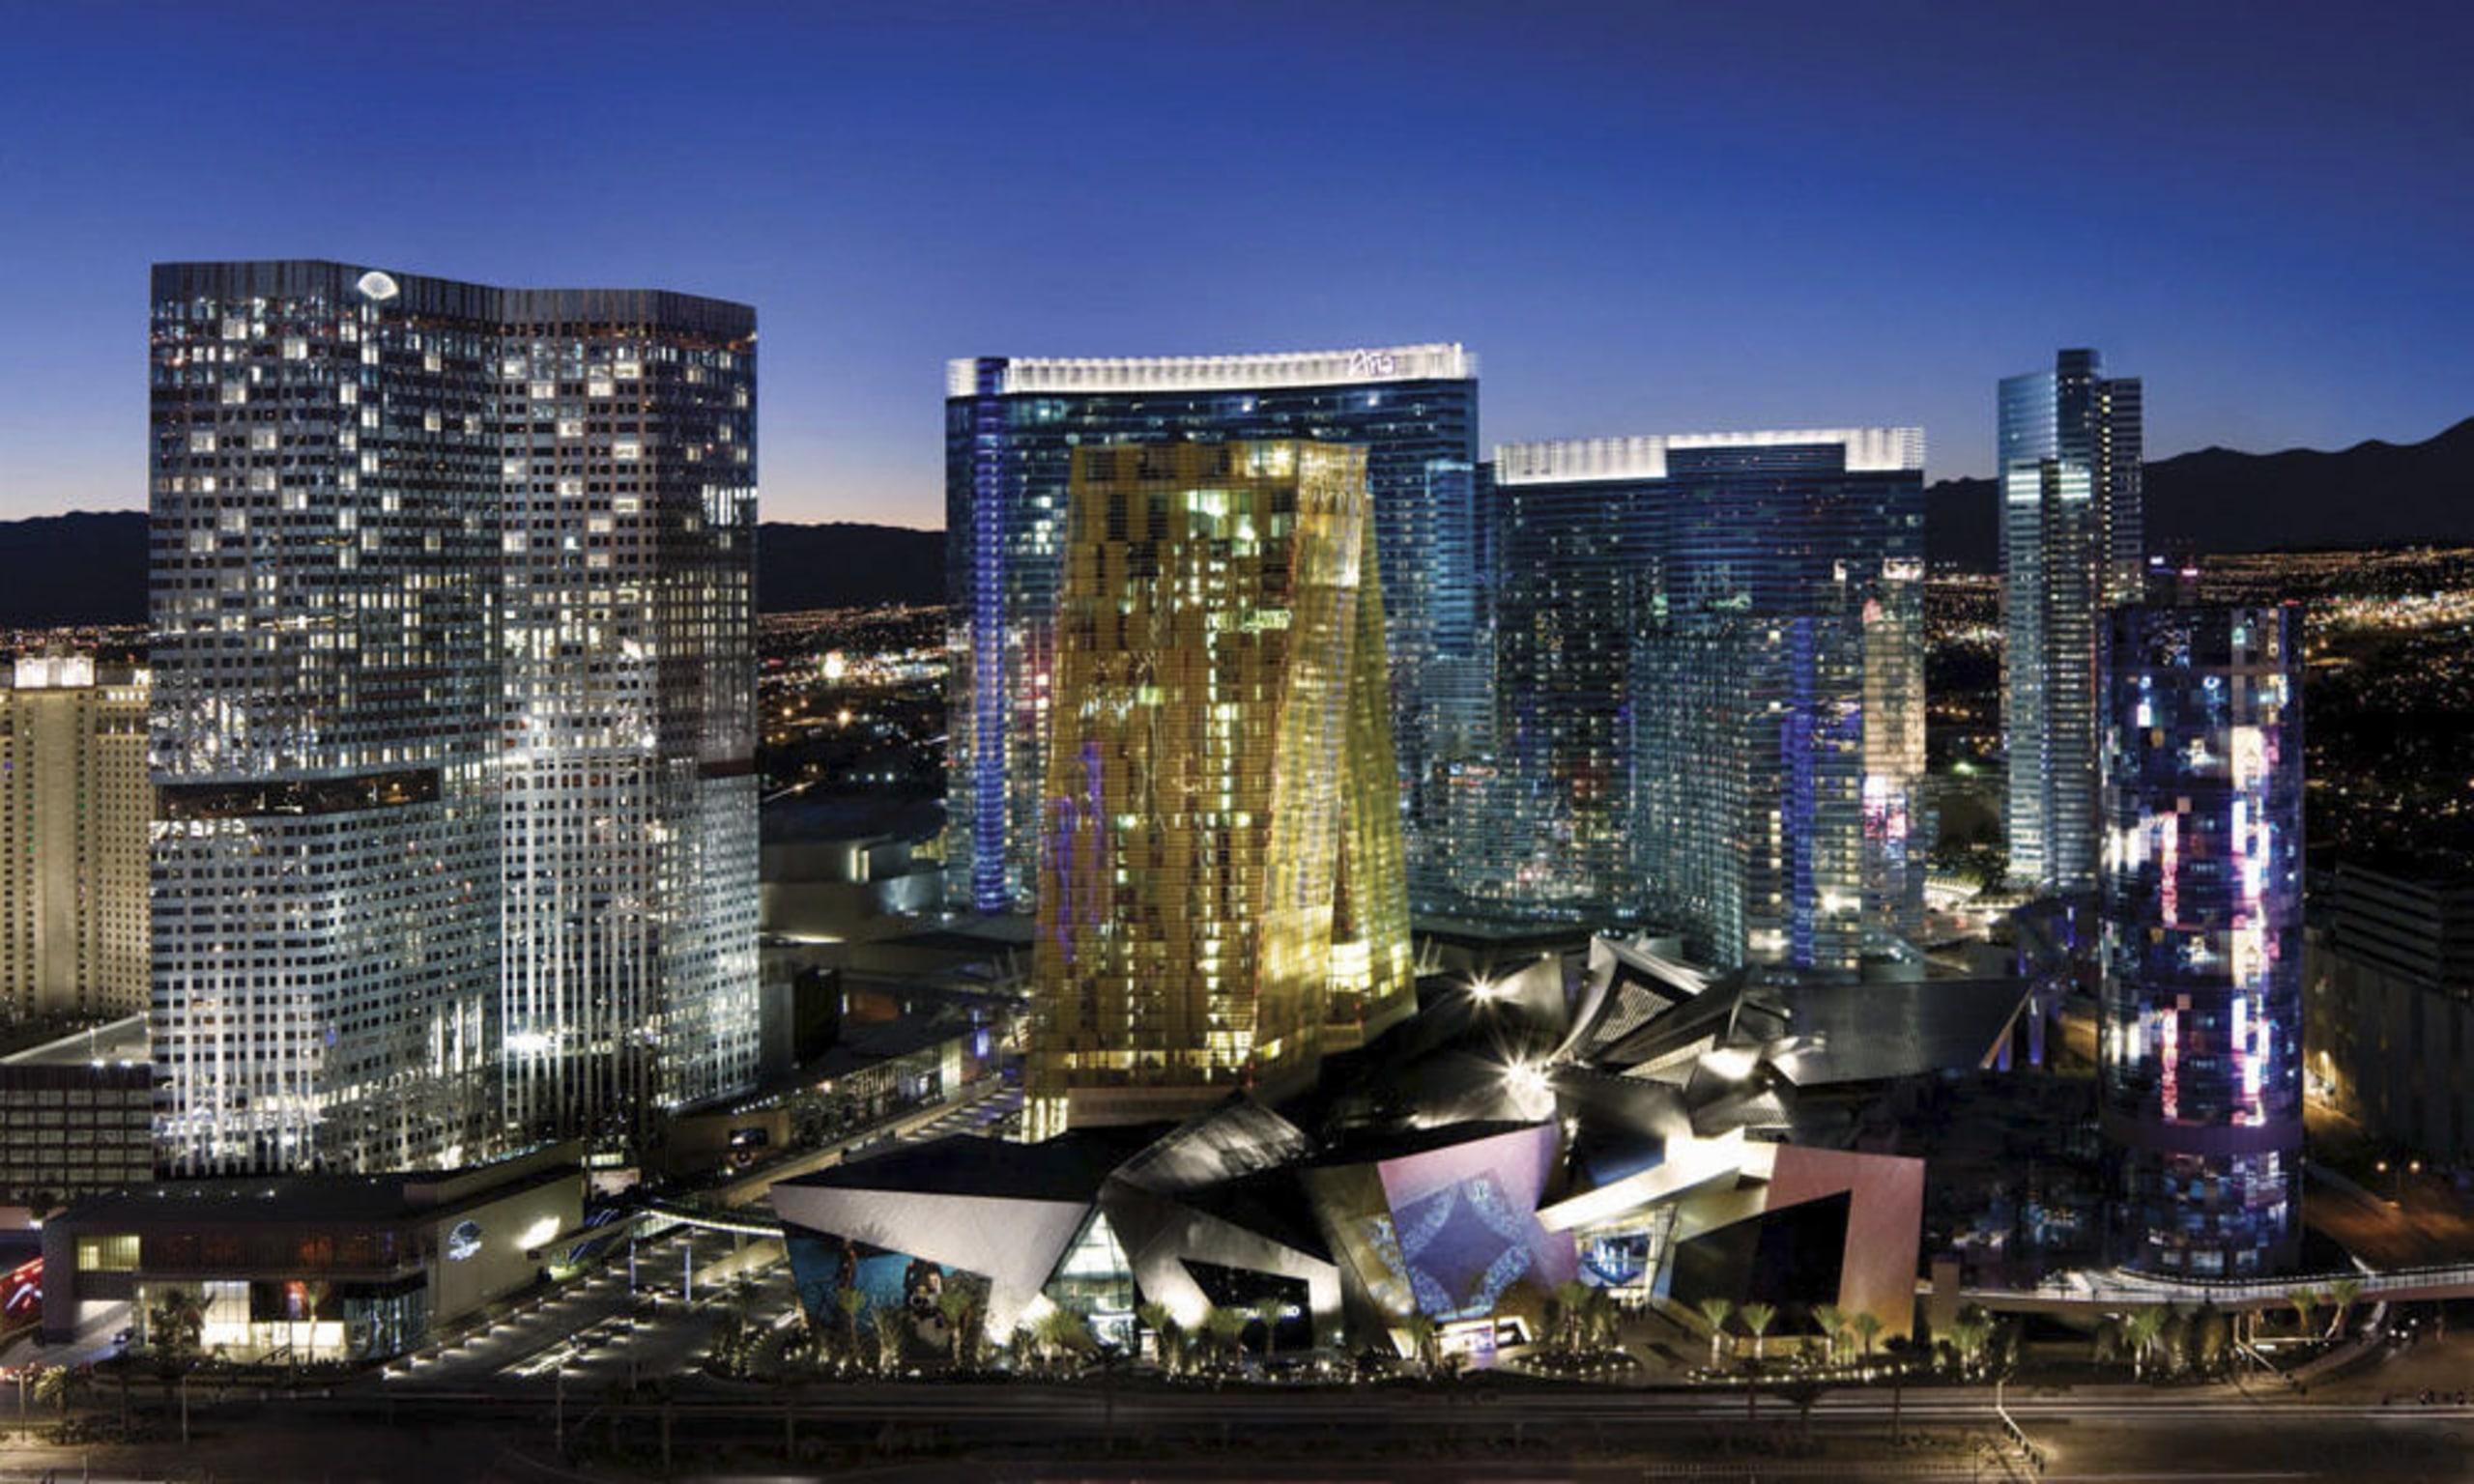 CityCenter, Las Vegas - CityCenter, Las Vegas - building, city, cityscape, commercial building, condominium, downtown, hotel, landmark, metropolis, metropolitan area, mixed use, night, skyline, skyscraper, tower block, urban area, blue, black